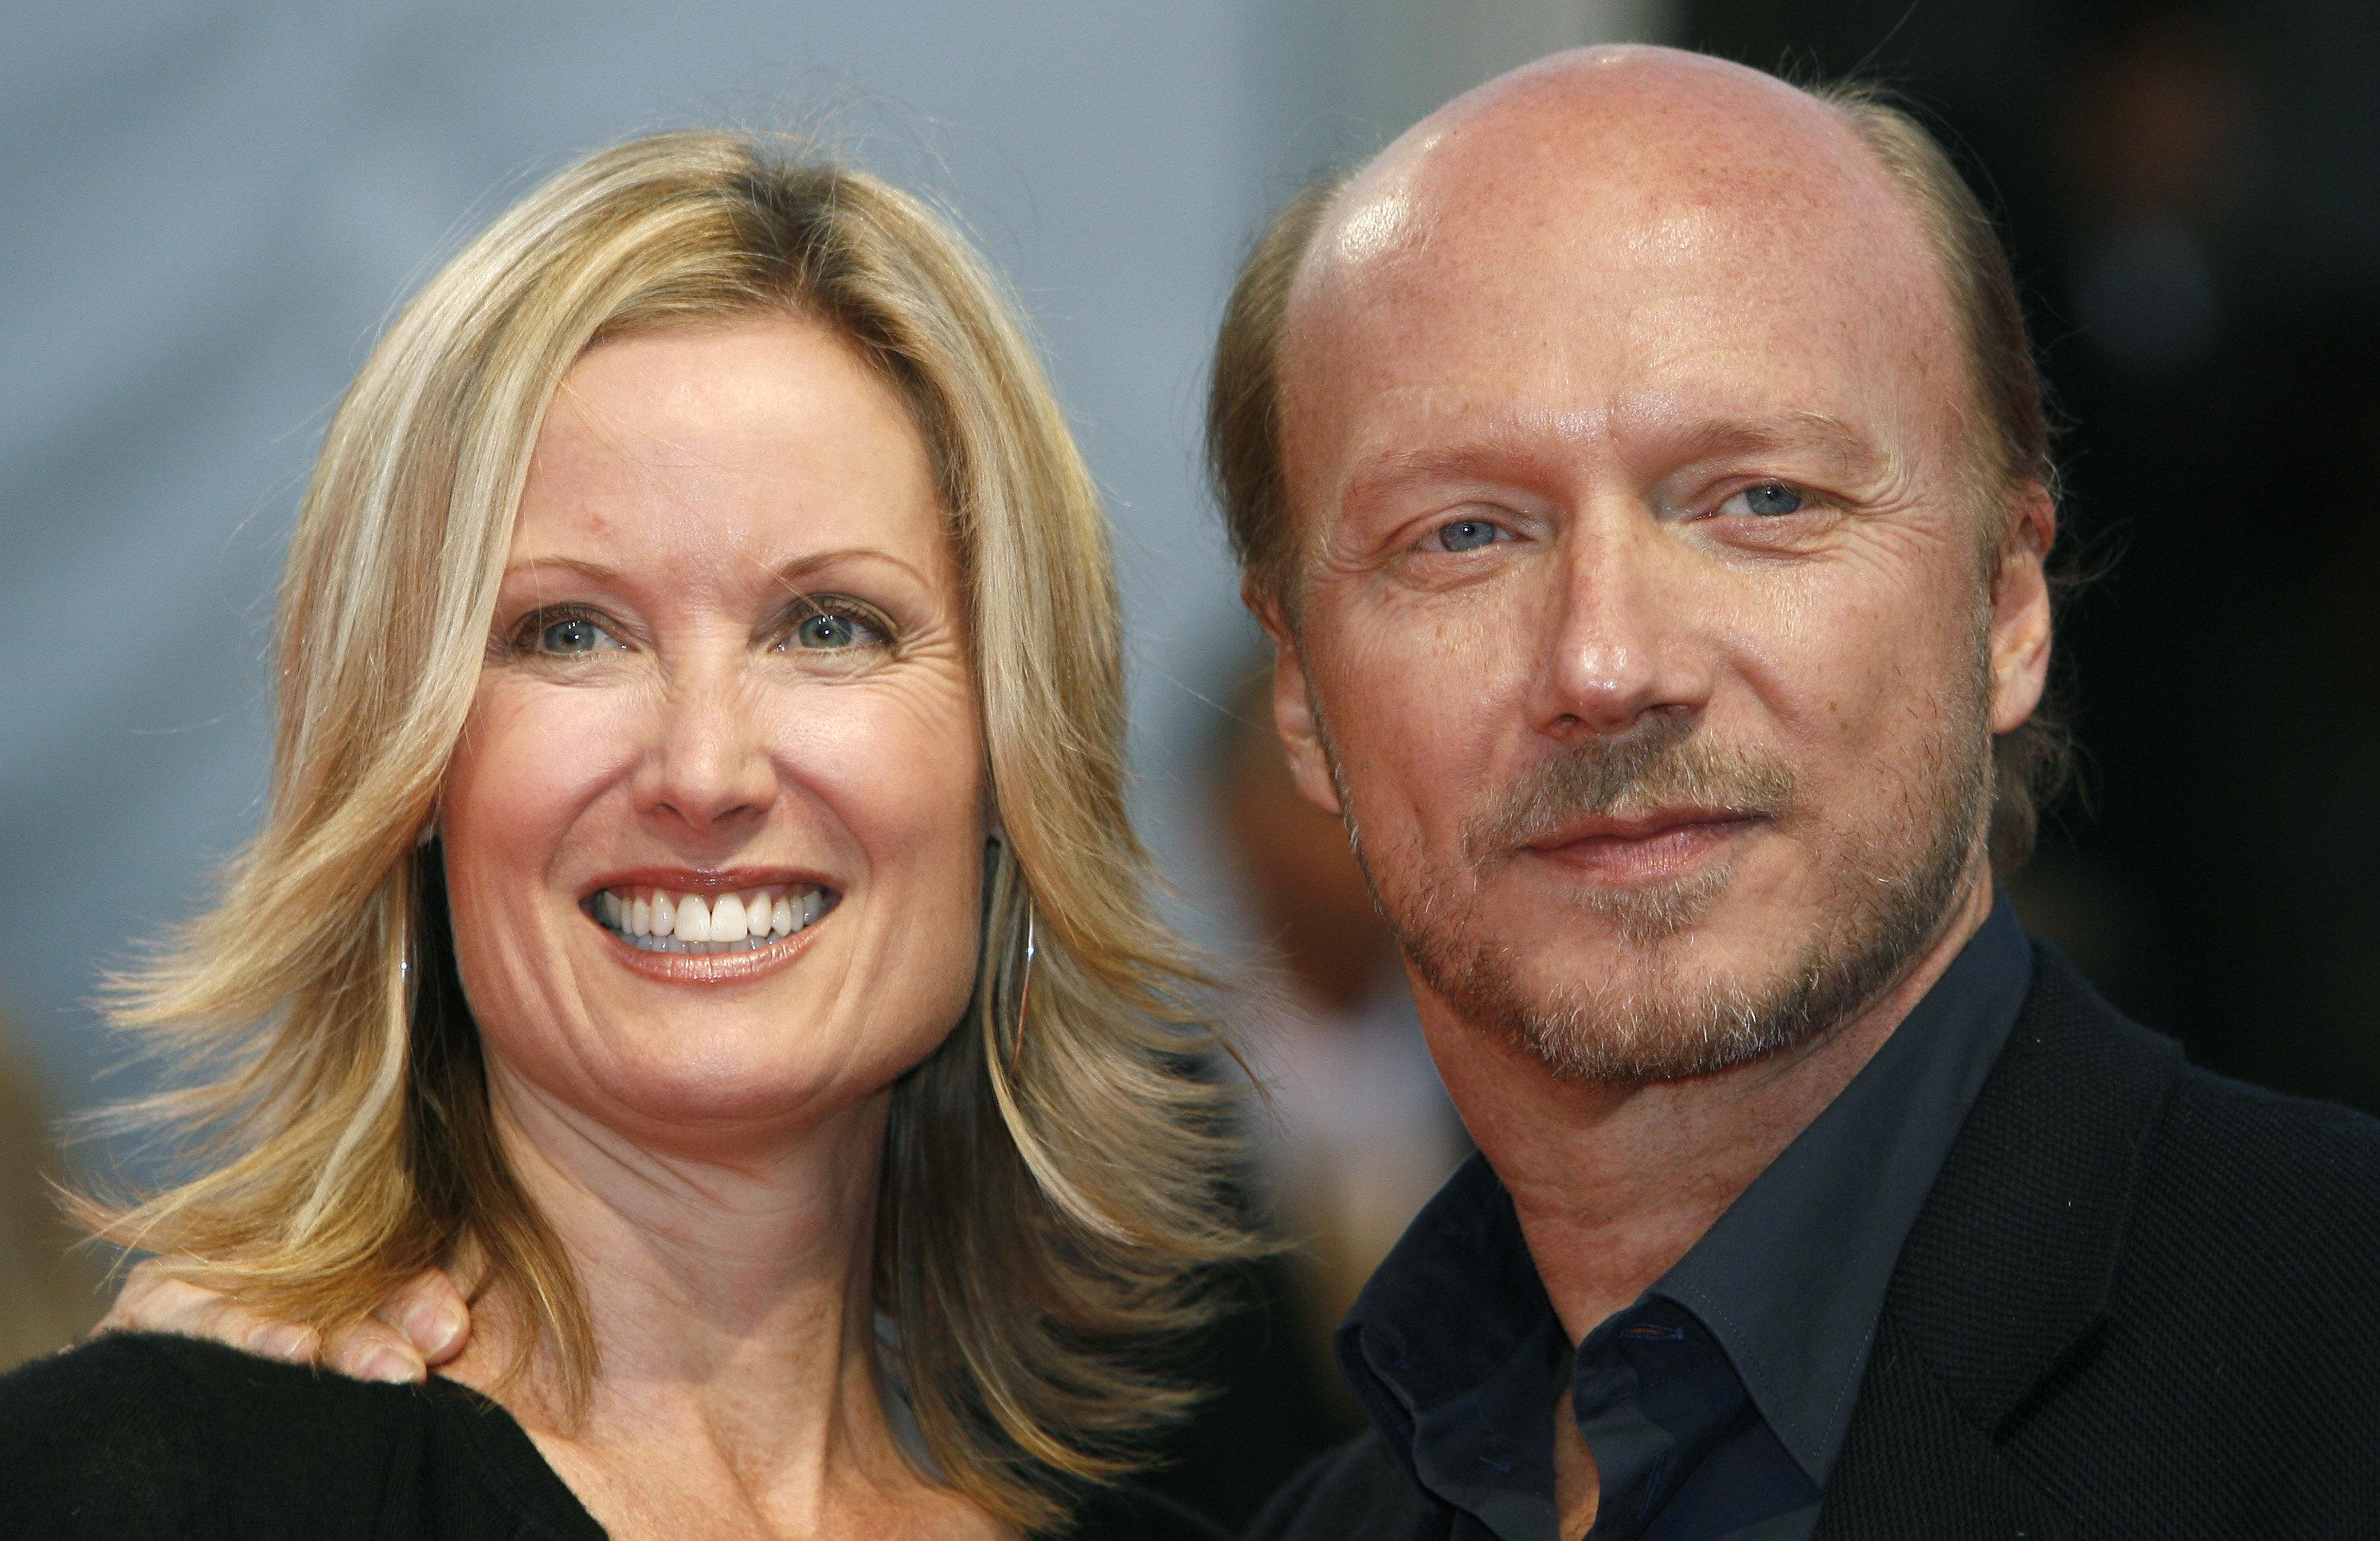 Deborah Rennard and Paul Haggis at the 33rd Deauville American Film Festival in September 2007.